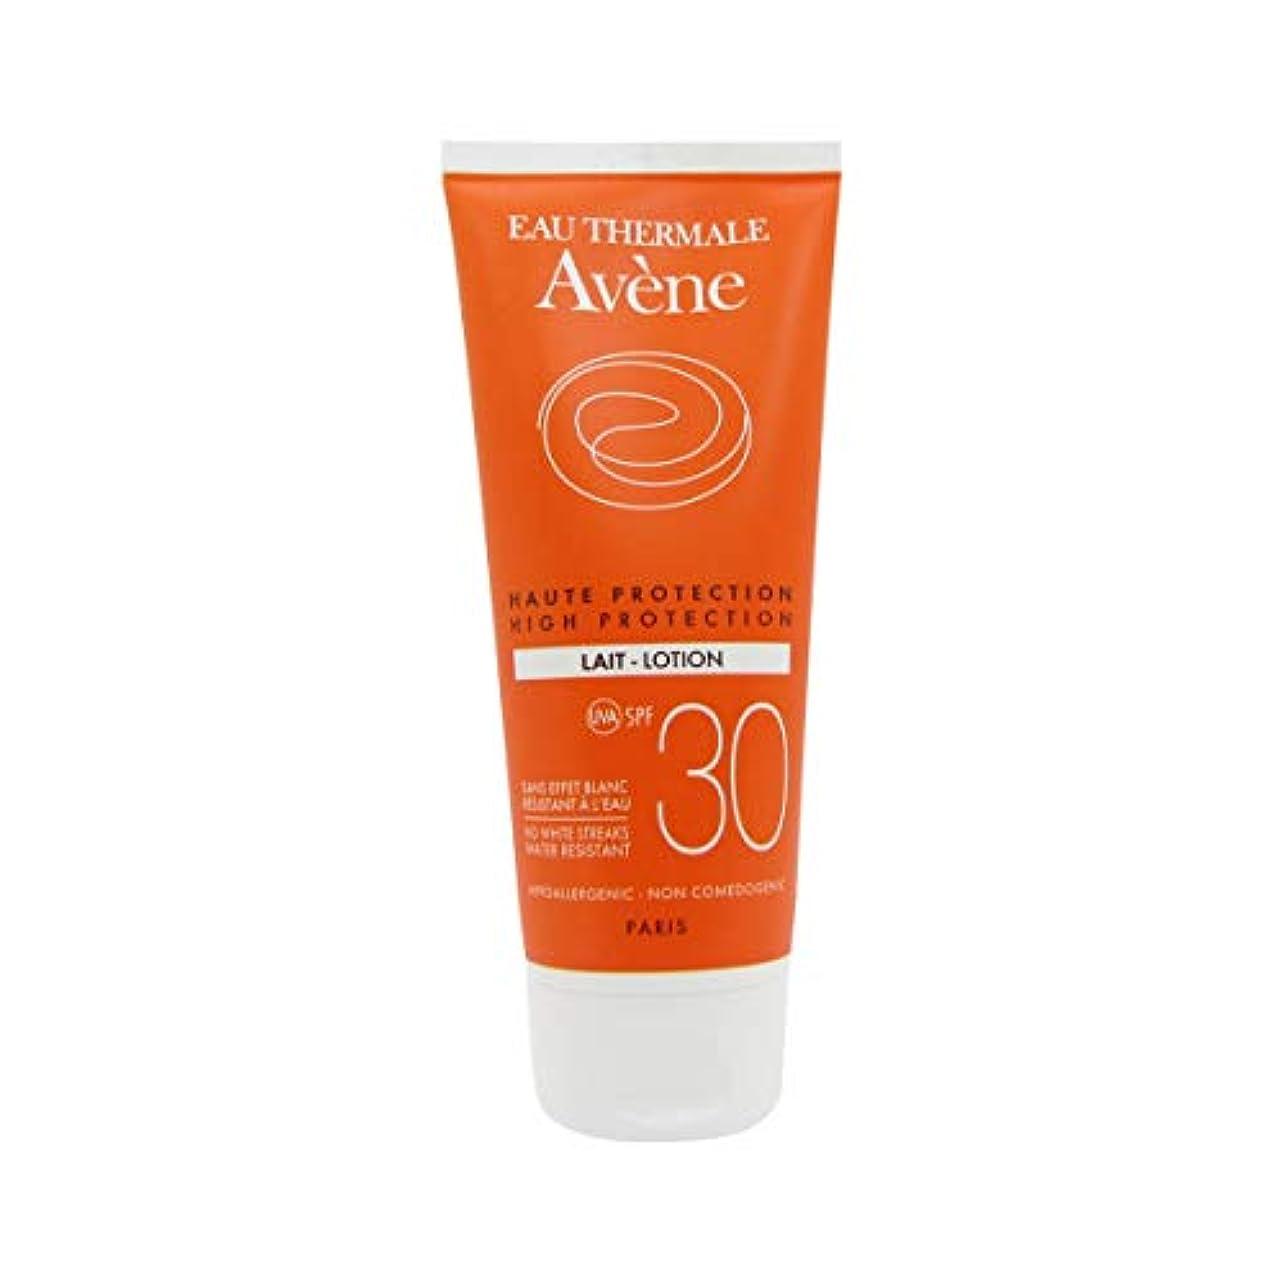 Avene Sunscreen Milk 30 100ml